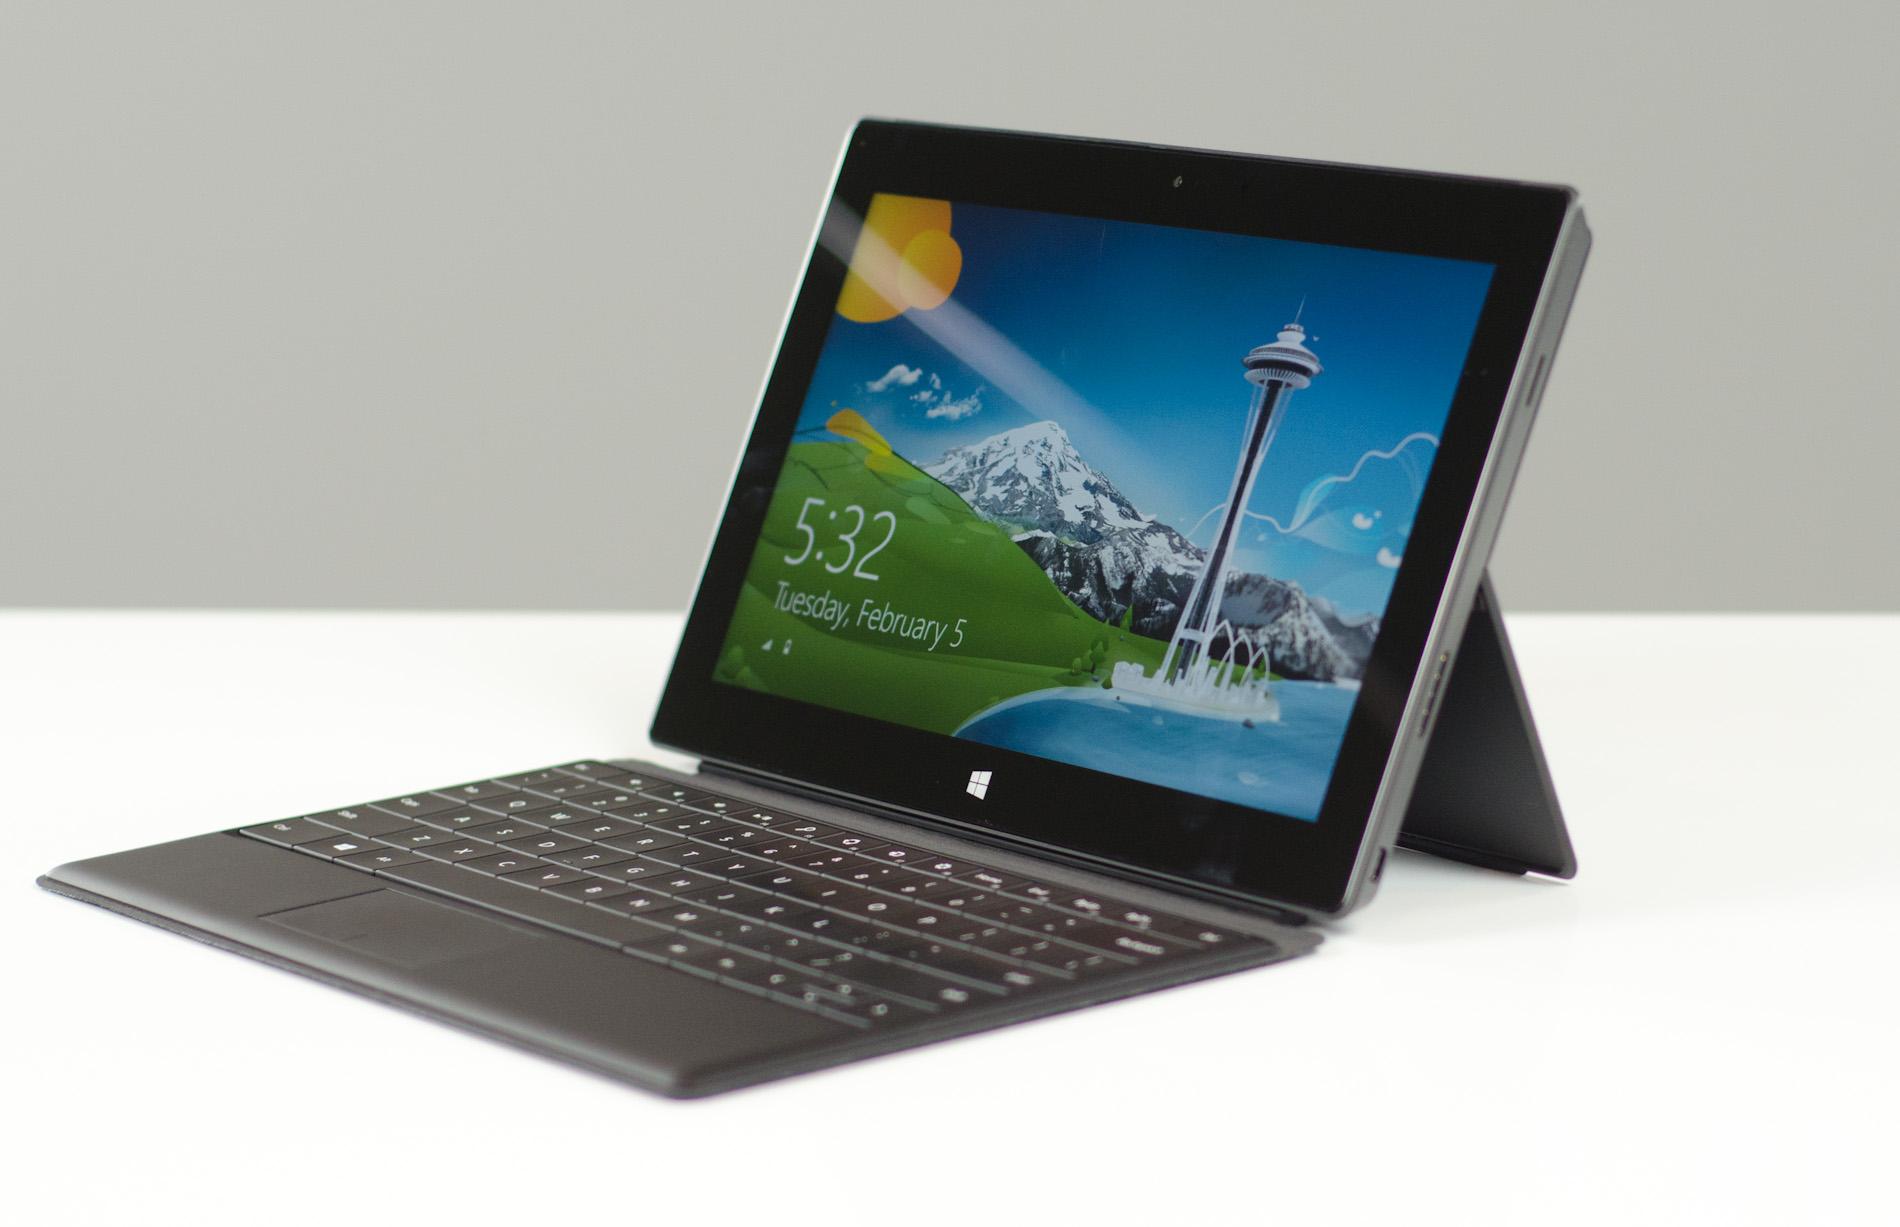 Microsoft pôs bateria menor no Surface Pro para deixá-lo mais leve